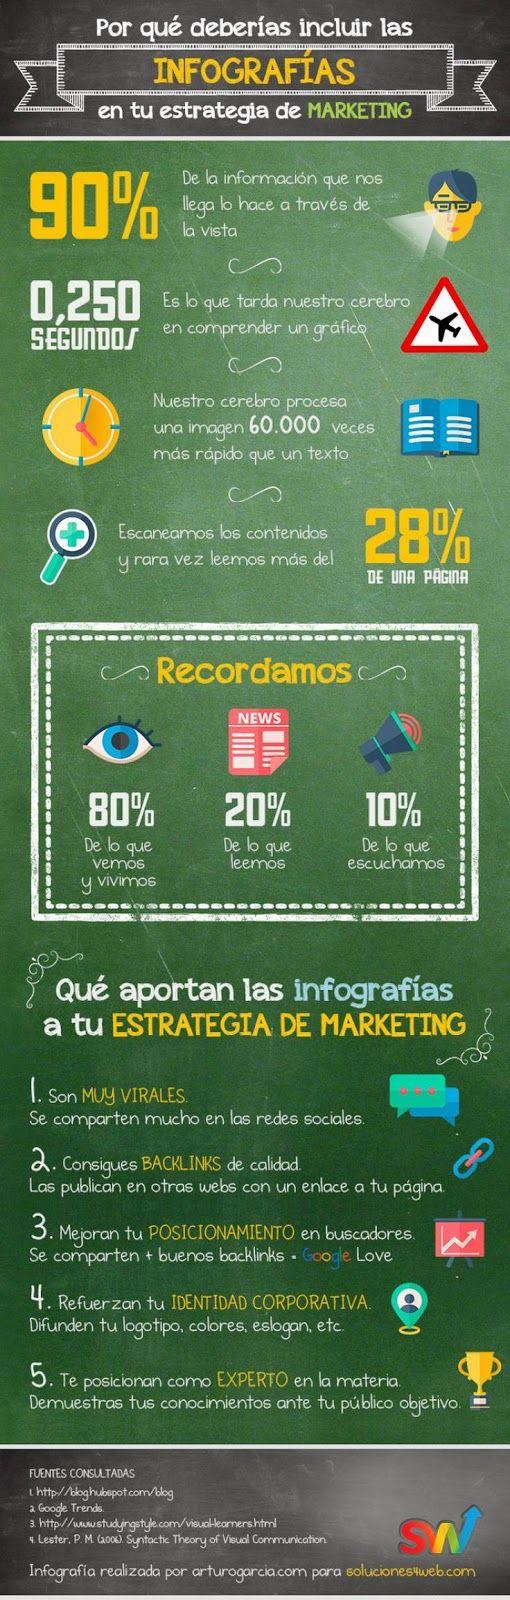 Miguel García González: Usa #infografías,saldrás ganando...